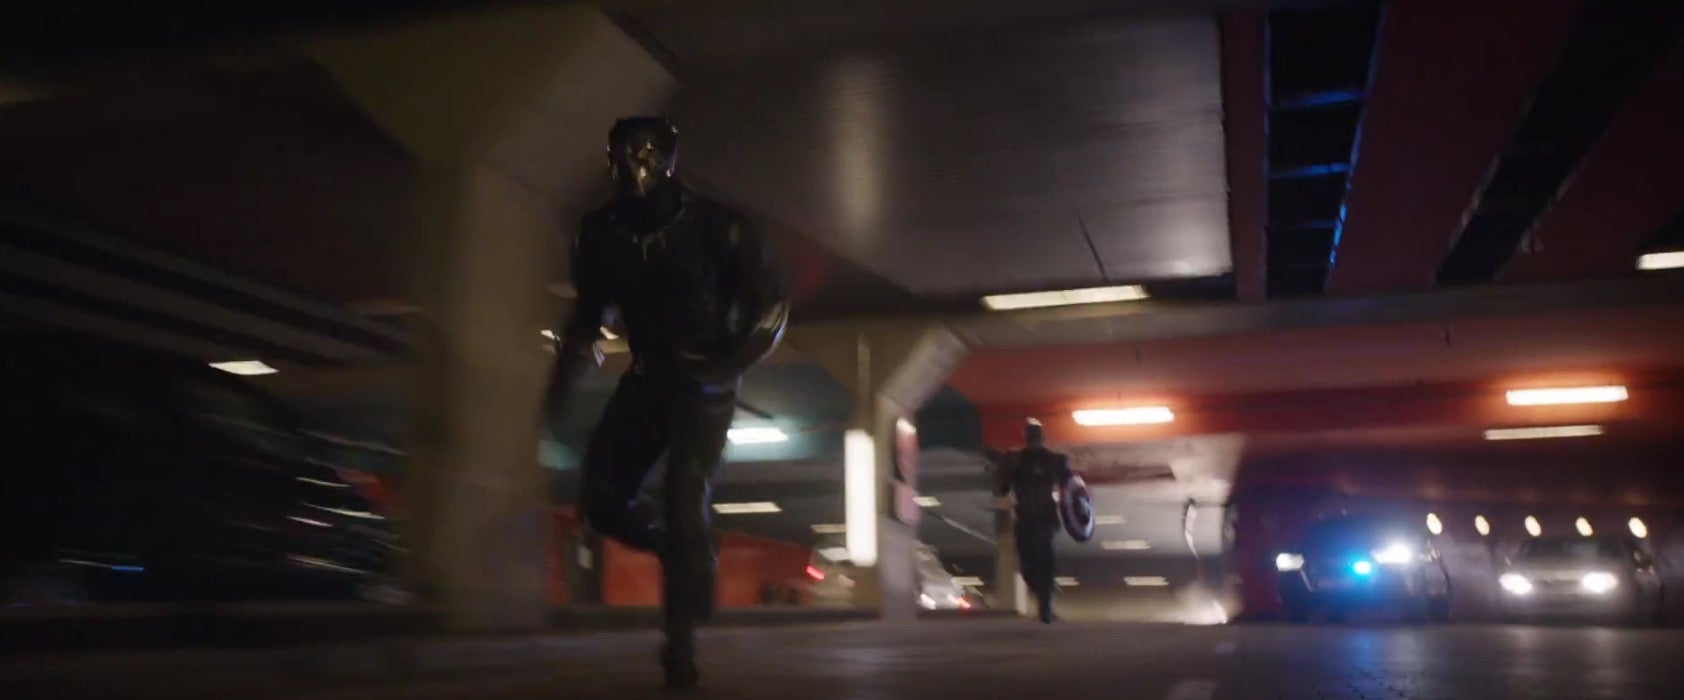 All the Cool Stuff in the New Captain America: Civil War Trailer